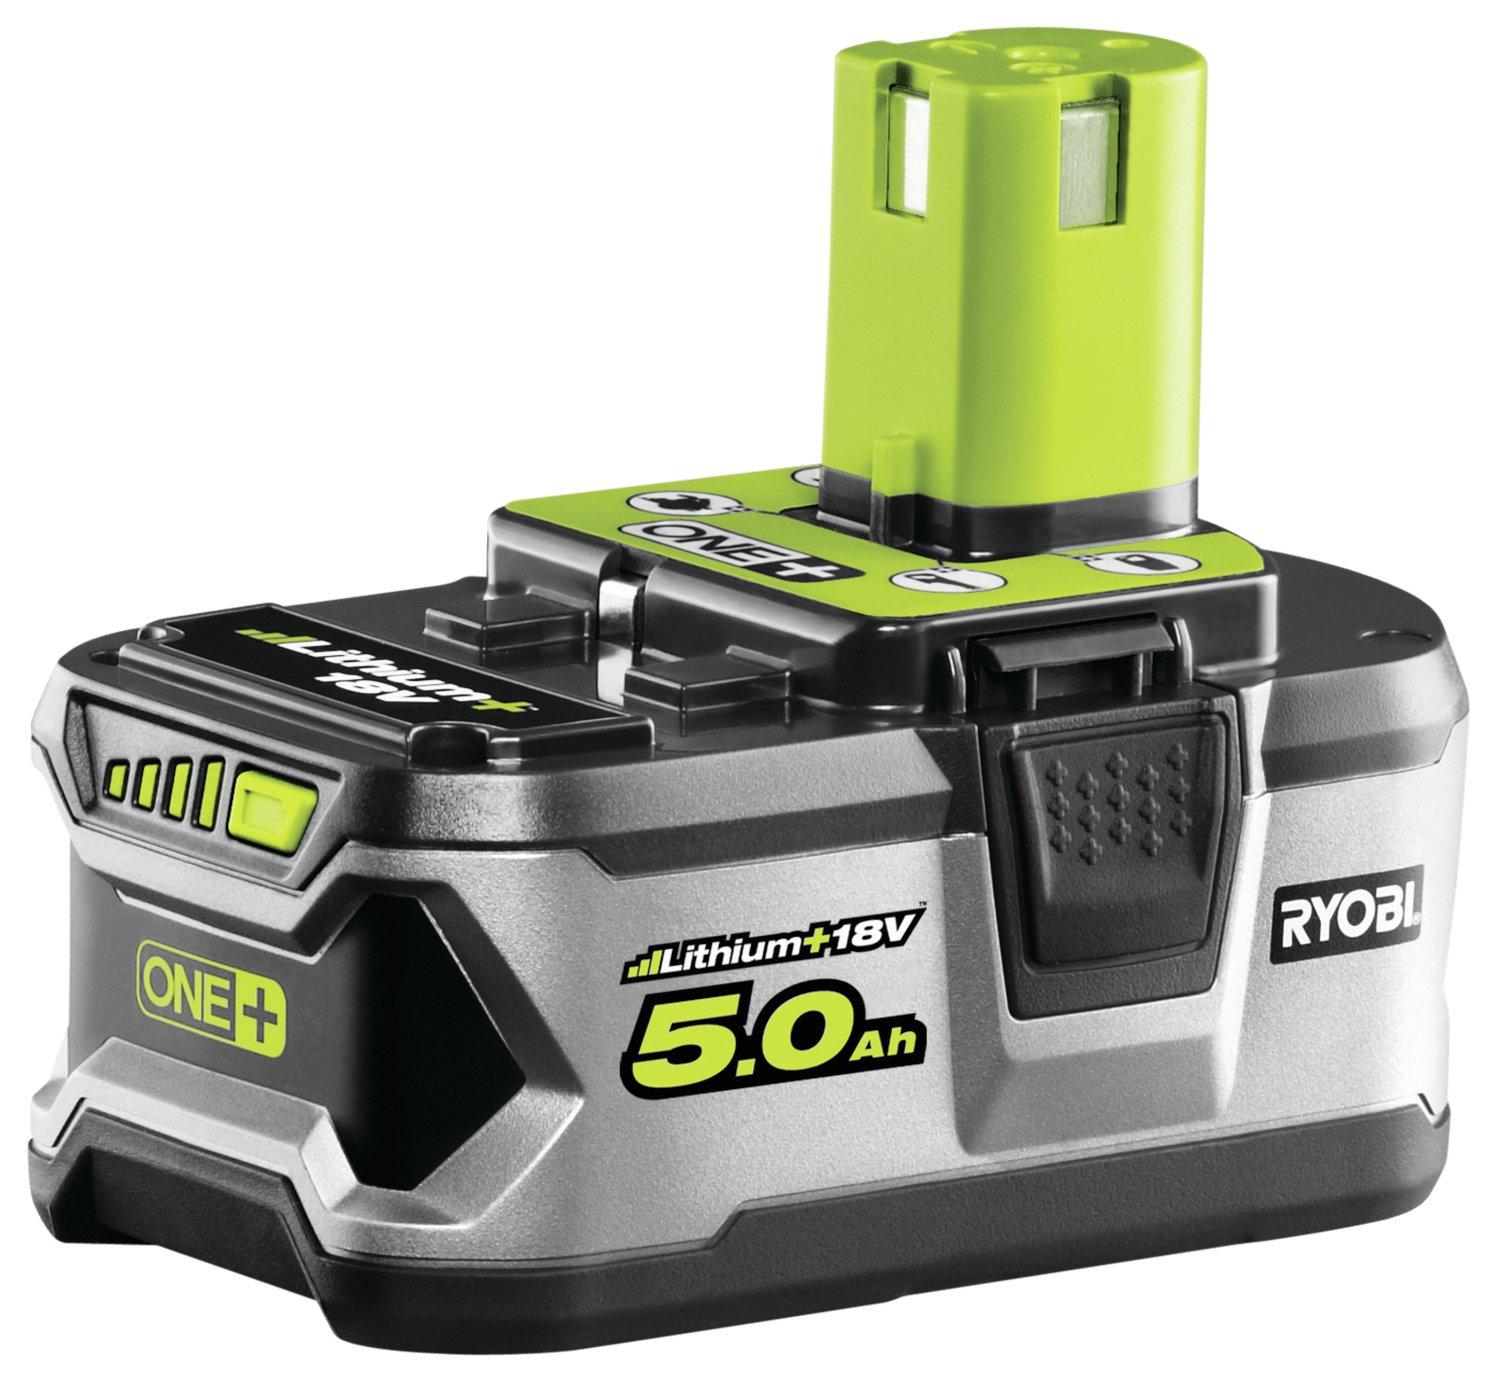 Ryobi RB18L50 ONE+ 5.0Ah Battery - 18V £70 @ Argos - free Click & Collect